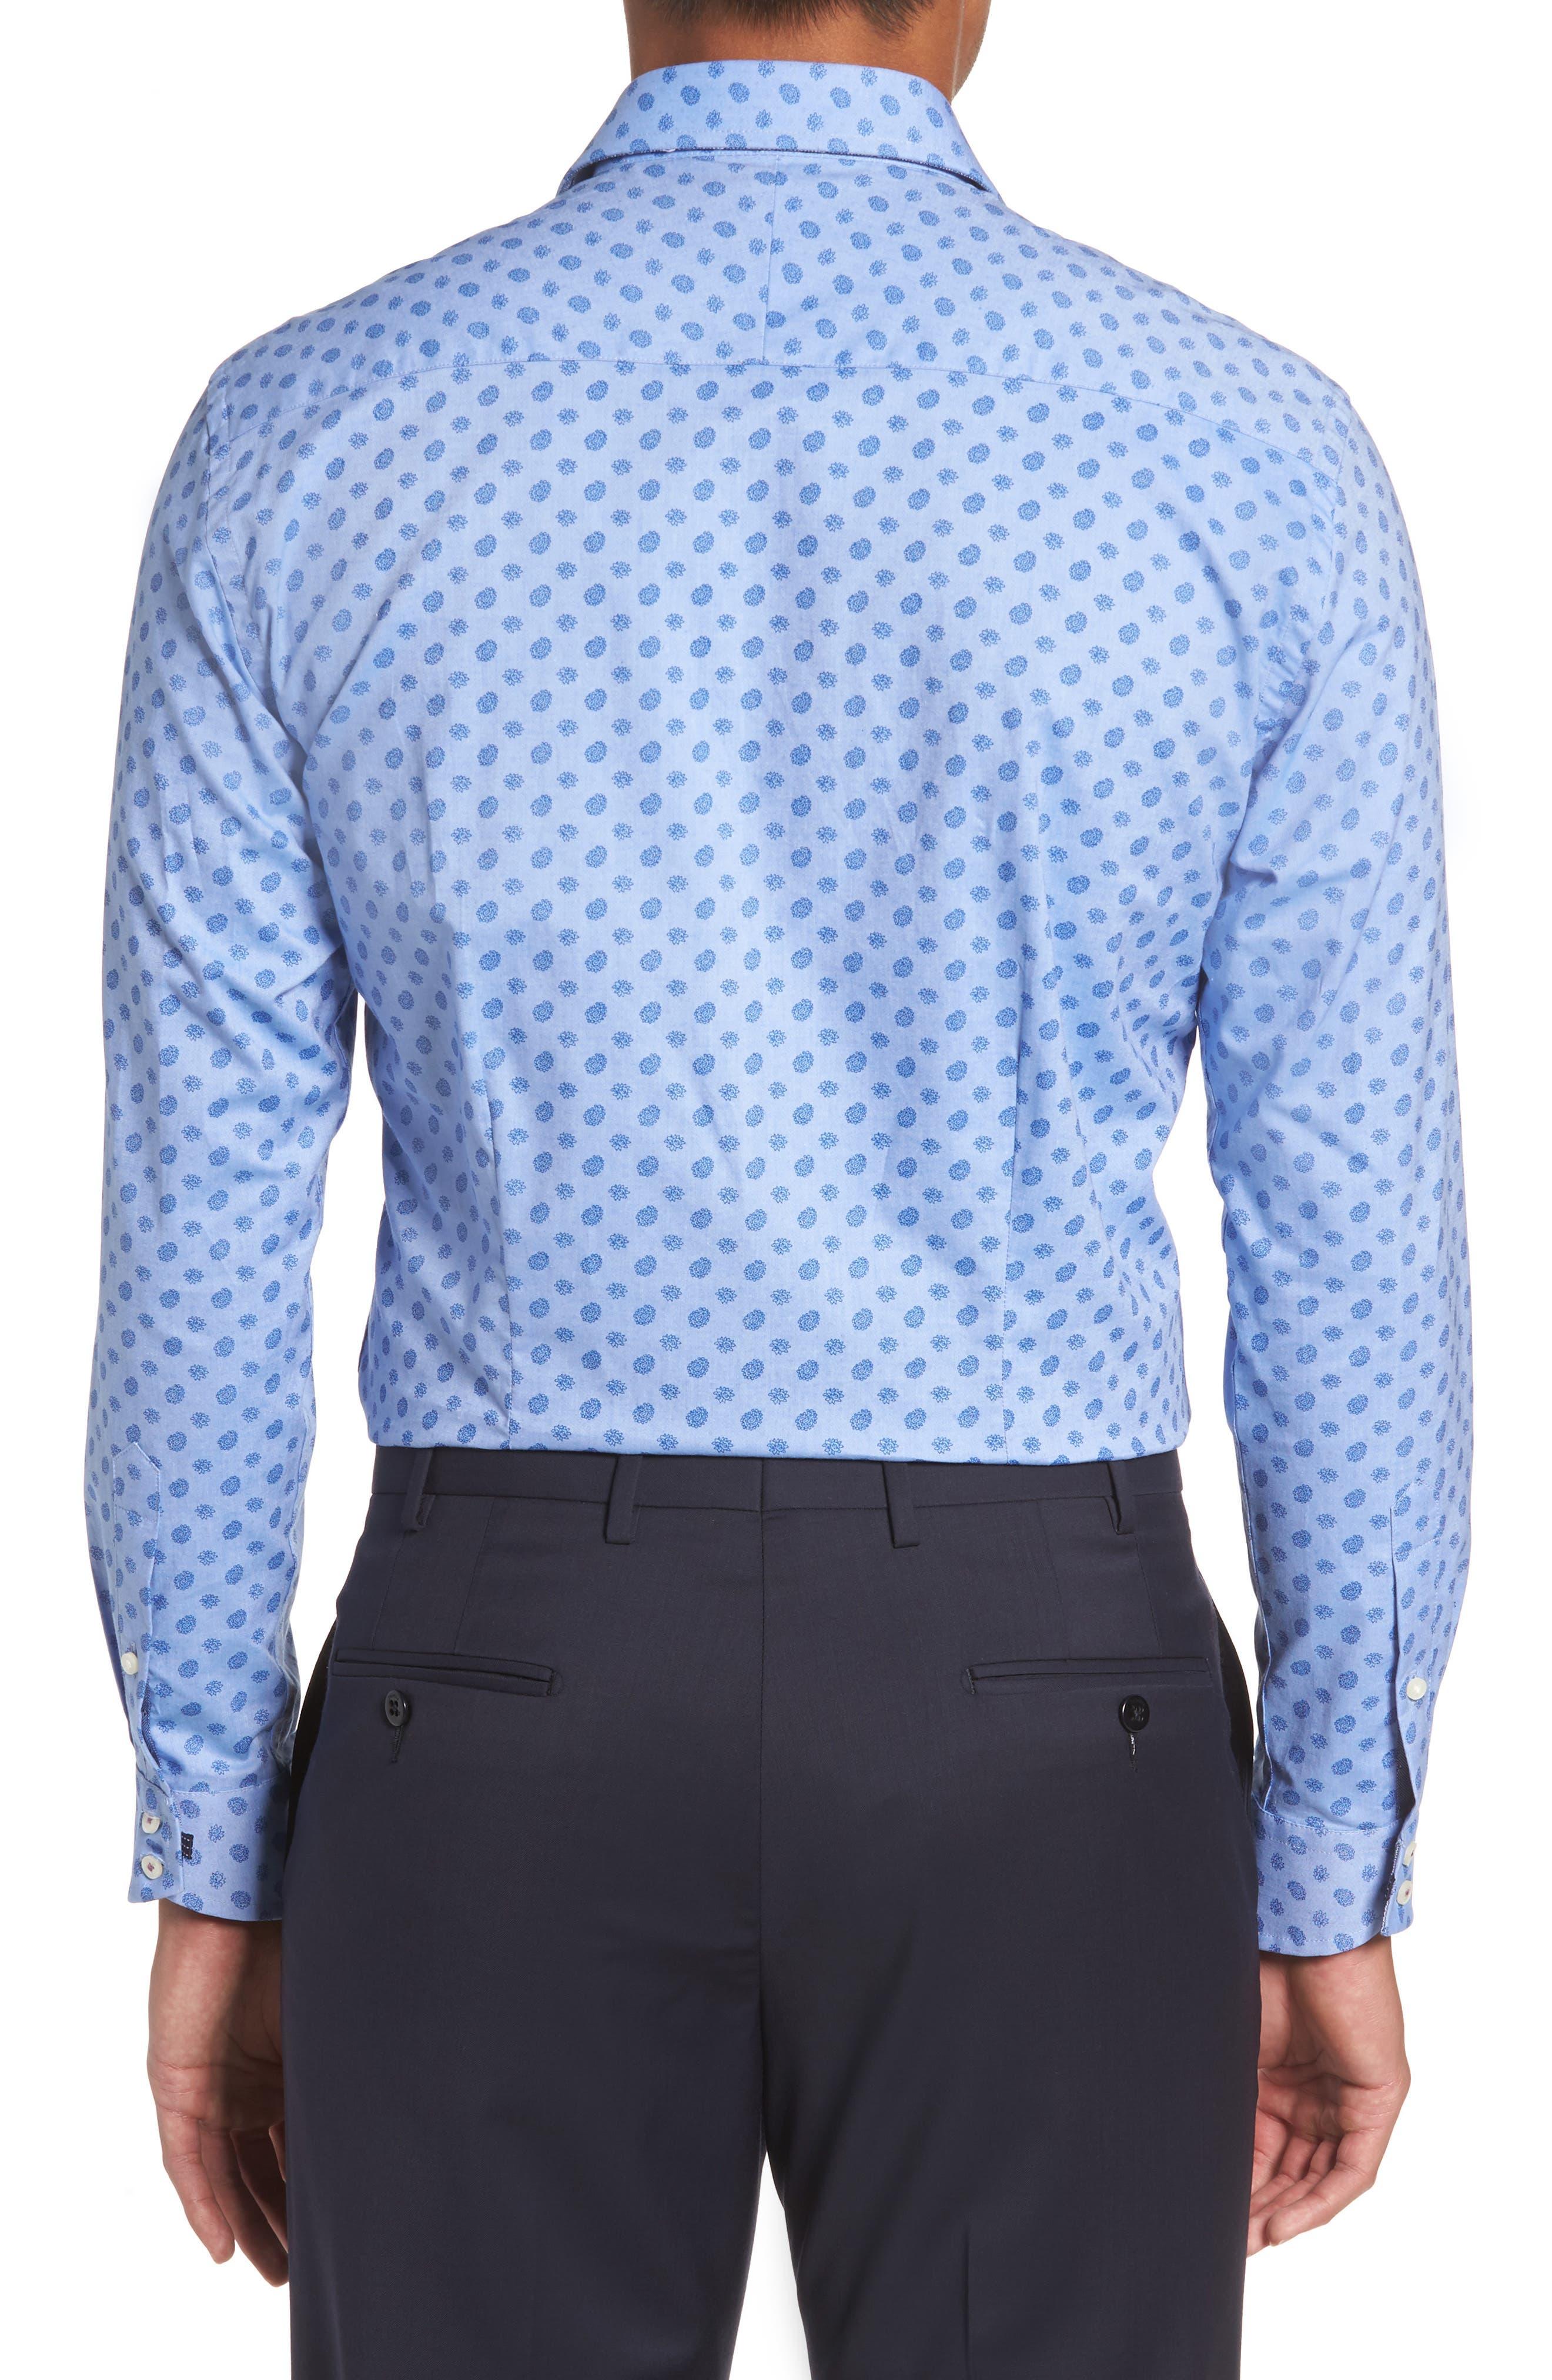 Midra Trim Fit Paisley Dress Shirt,                             Alternate thumbnail 3, color,                             Blue